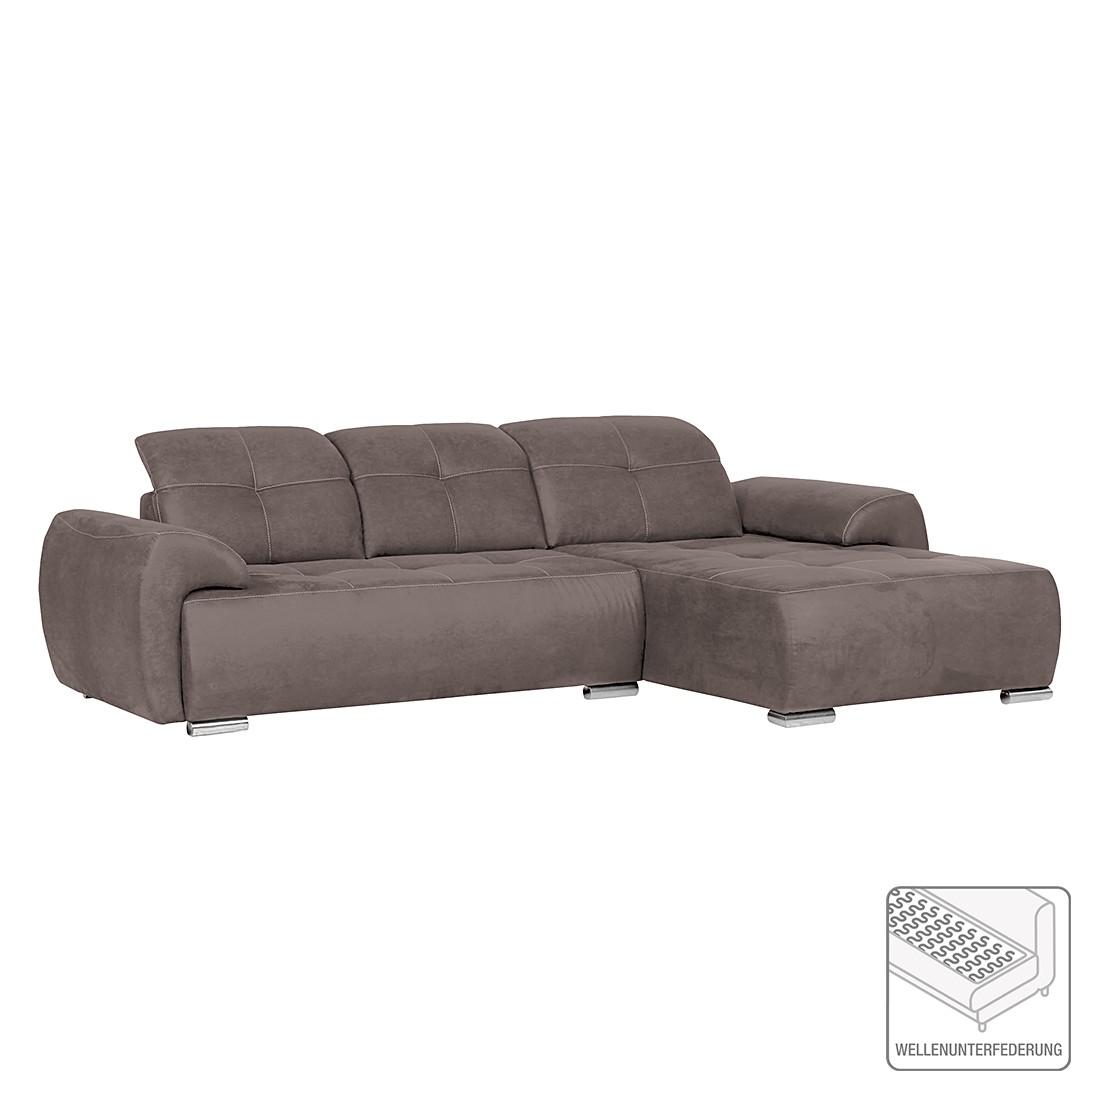 ecksofa lester microfaser longchair davorstehend rechts braun furnlab online bestellen. Black Bedroom Furniture Sets. Home Design Ideas